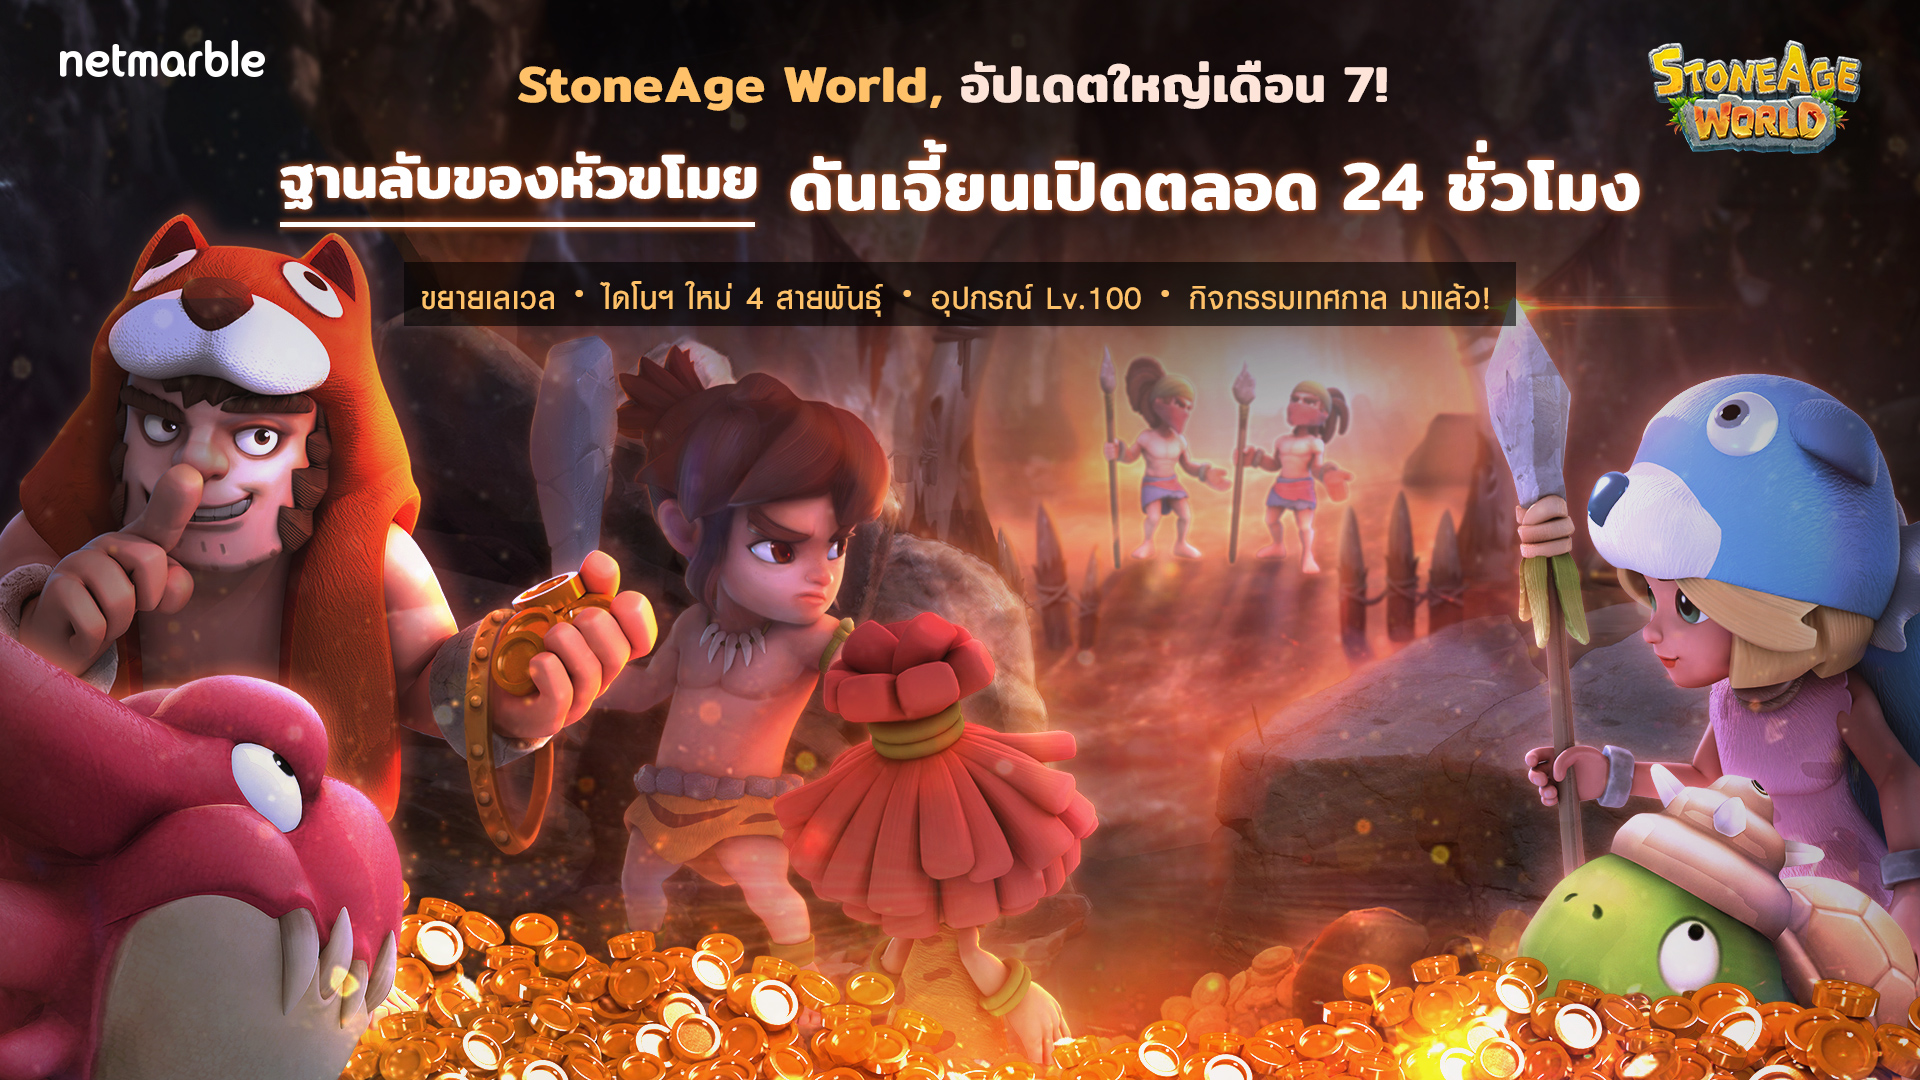 StoneAge World 2372020 2